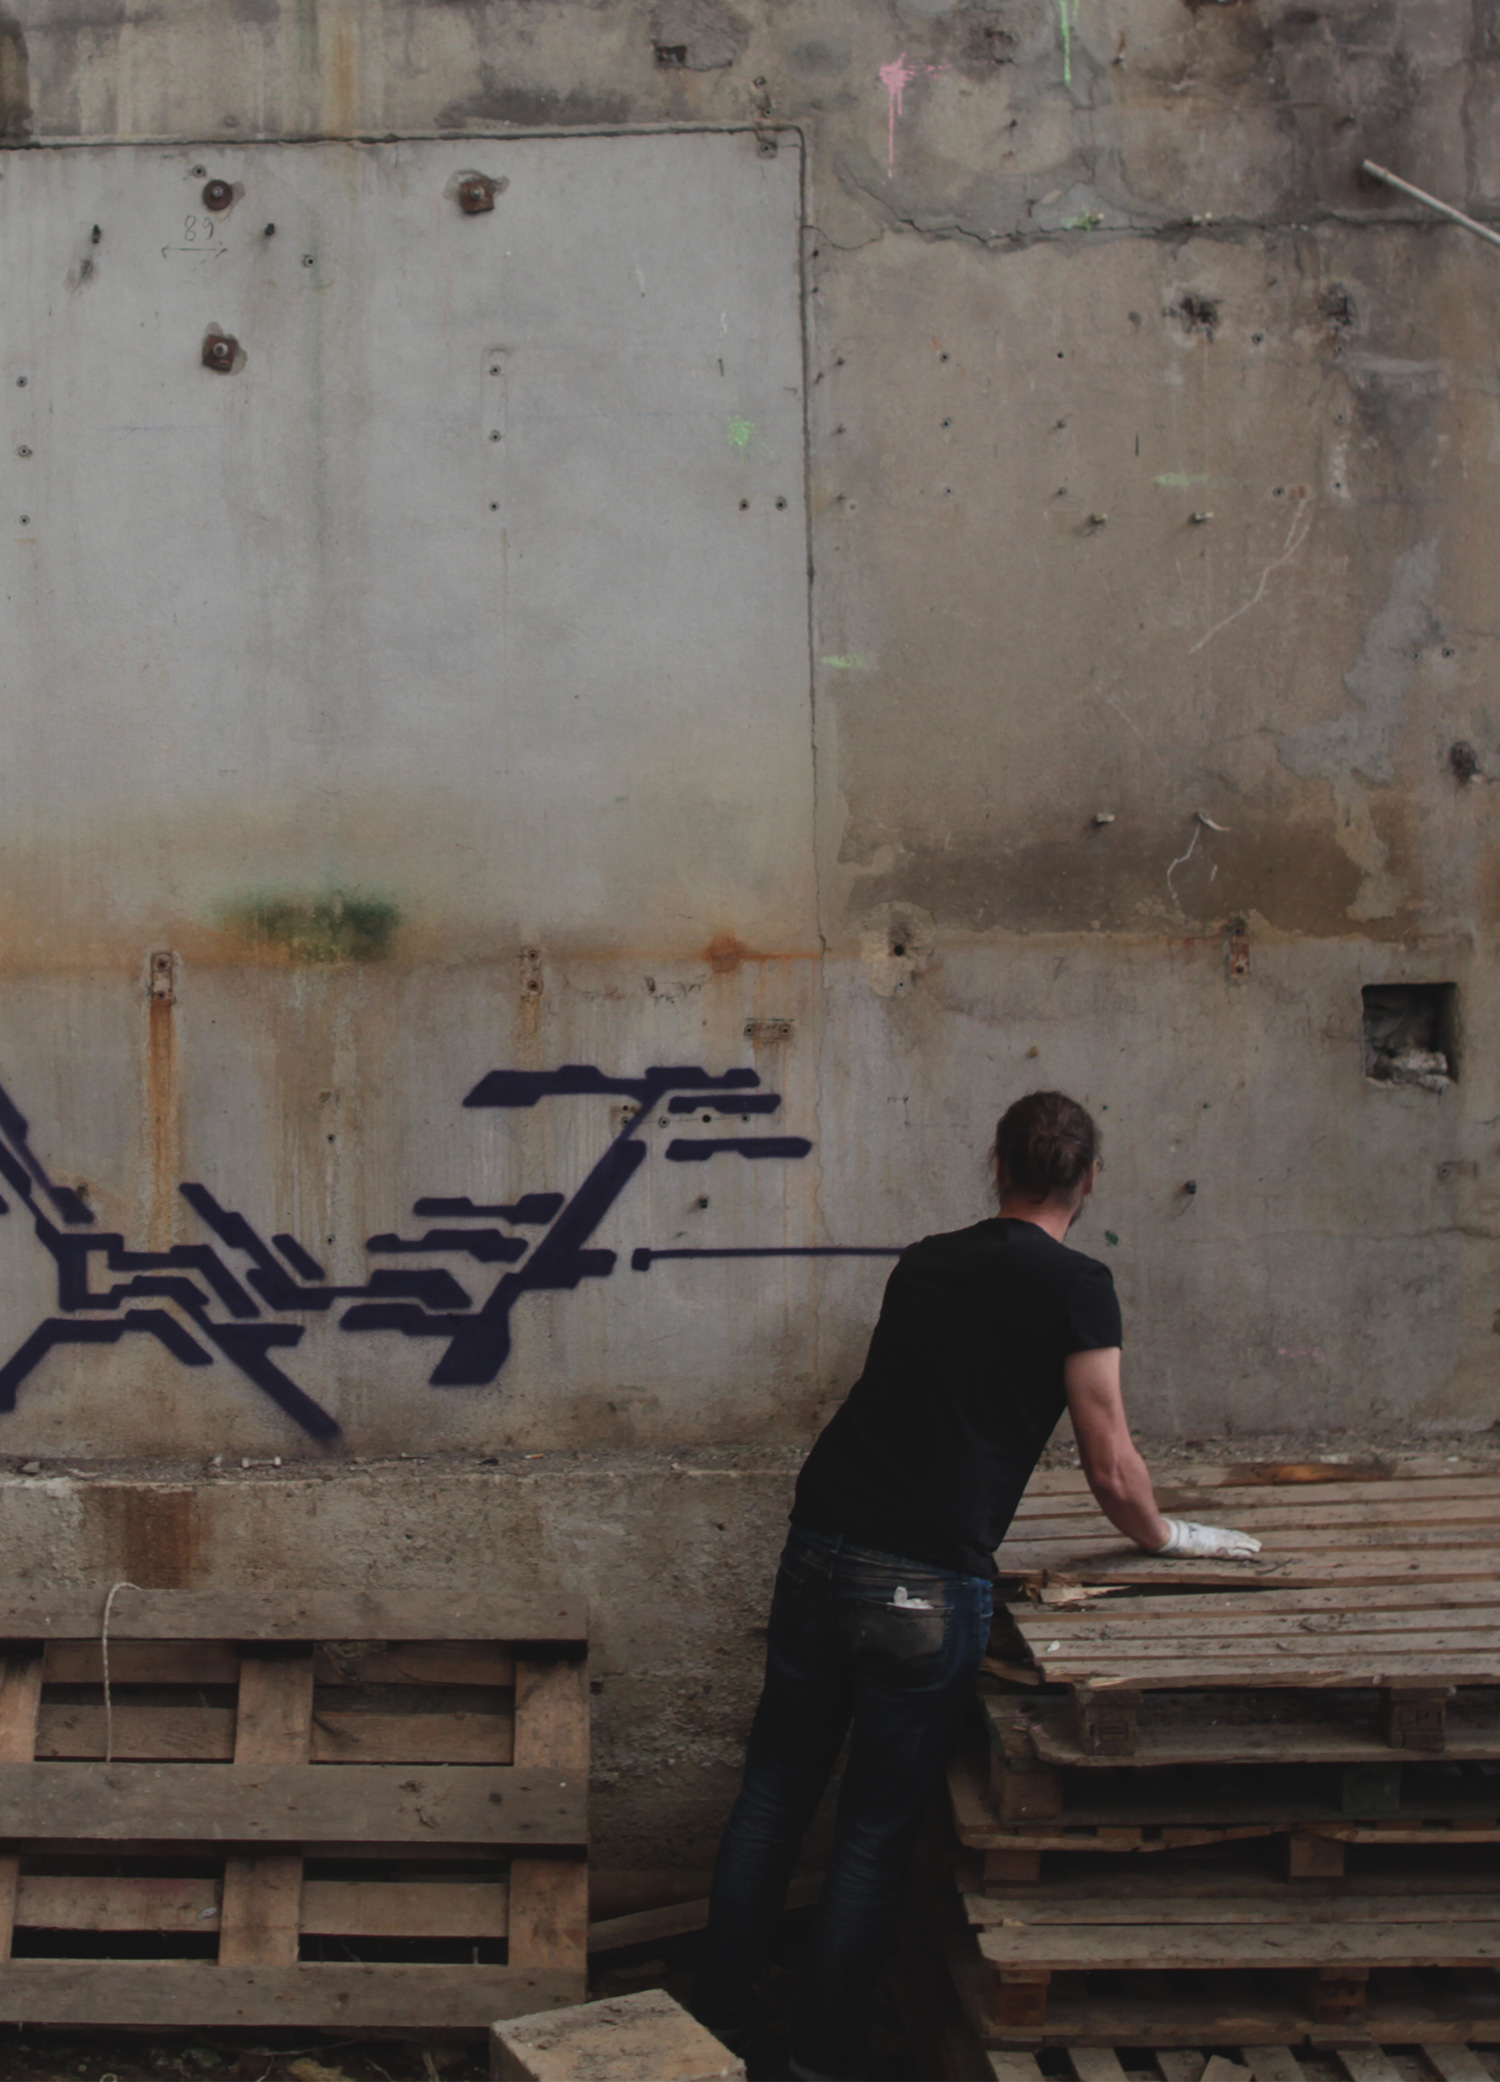 Lek-Sowat-DMV-da-mental-vaporz-urbex-usine-saint-etienne-graffiti-soldart-tag-montana-bombe-spray-Hugo-soie-saint-just-saint-rambert-royx-nicolas-royol-13